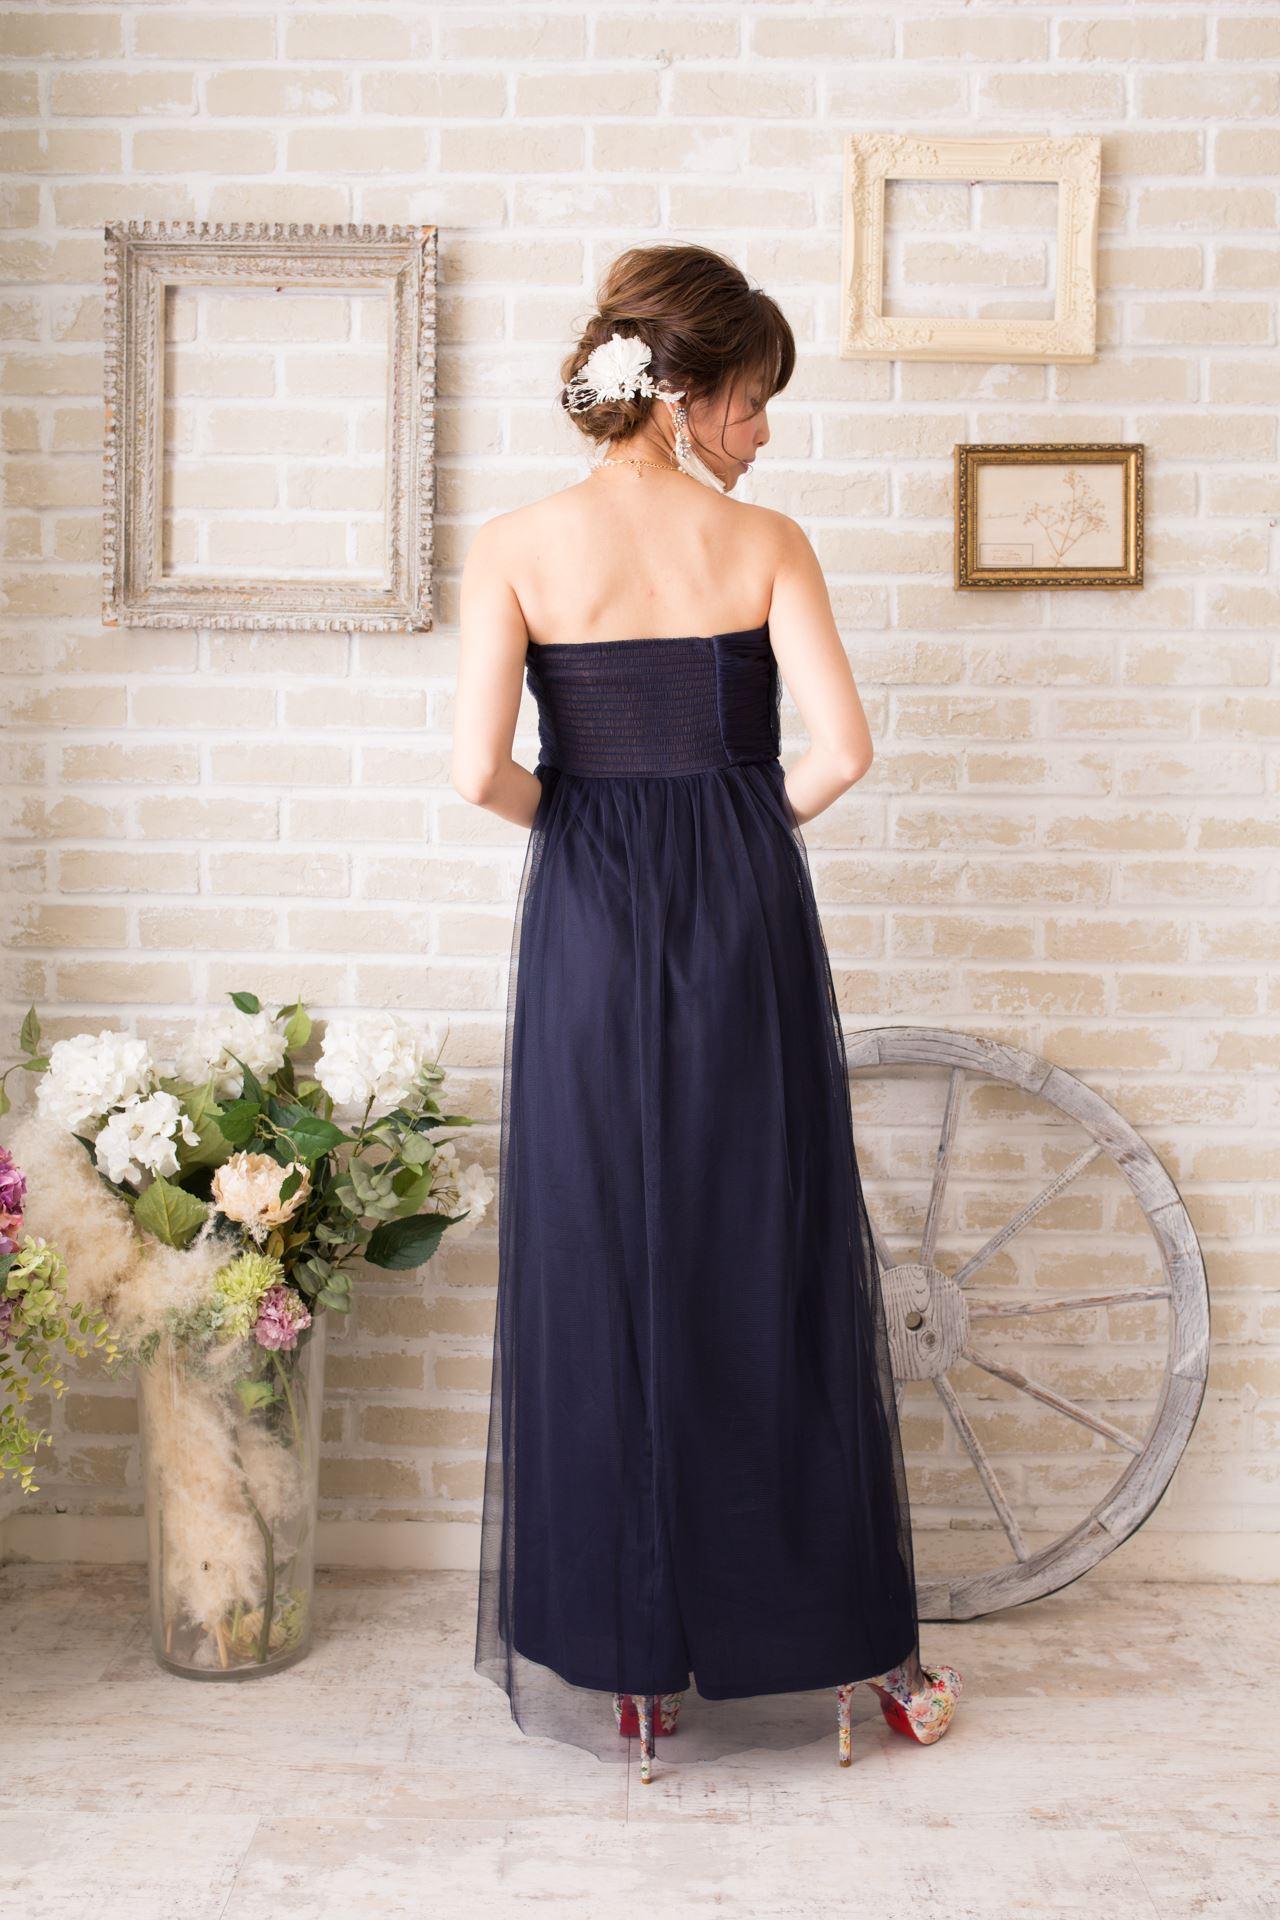 yk_nr_dress_422